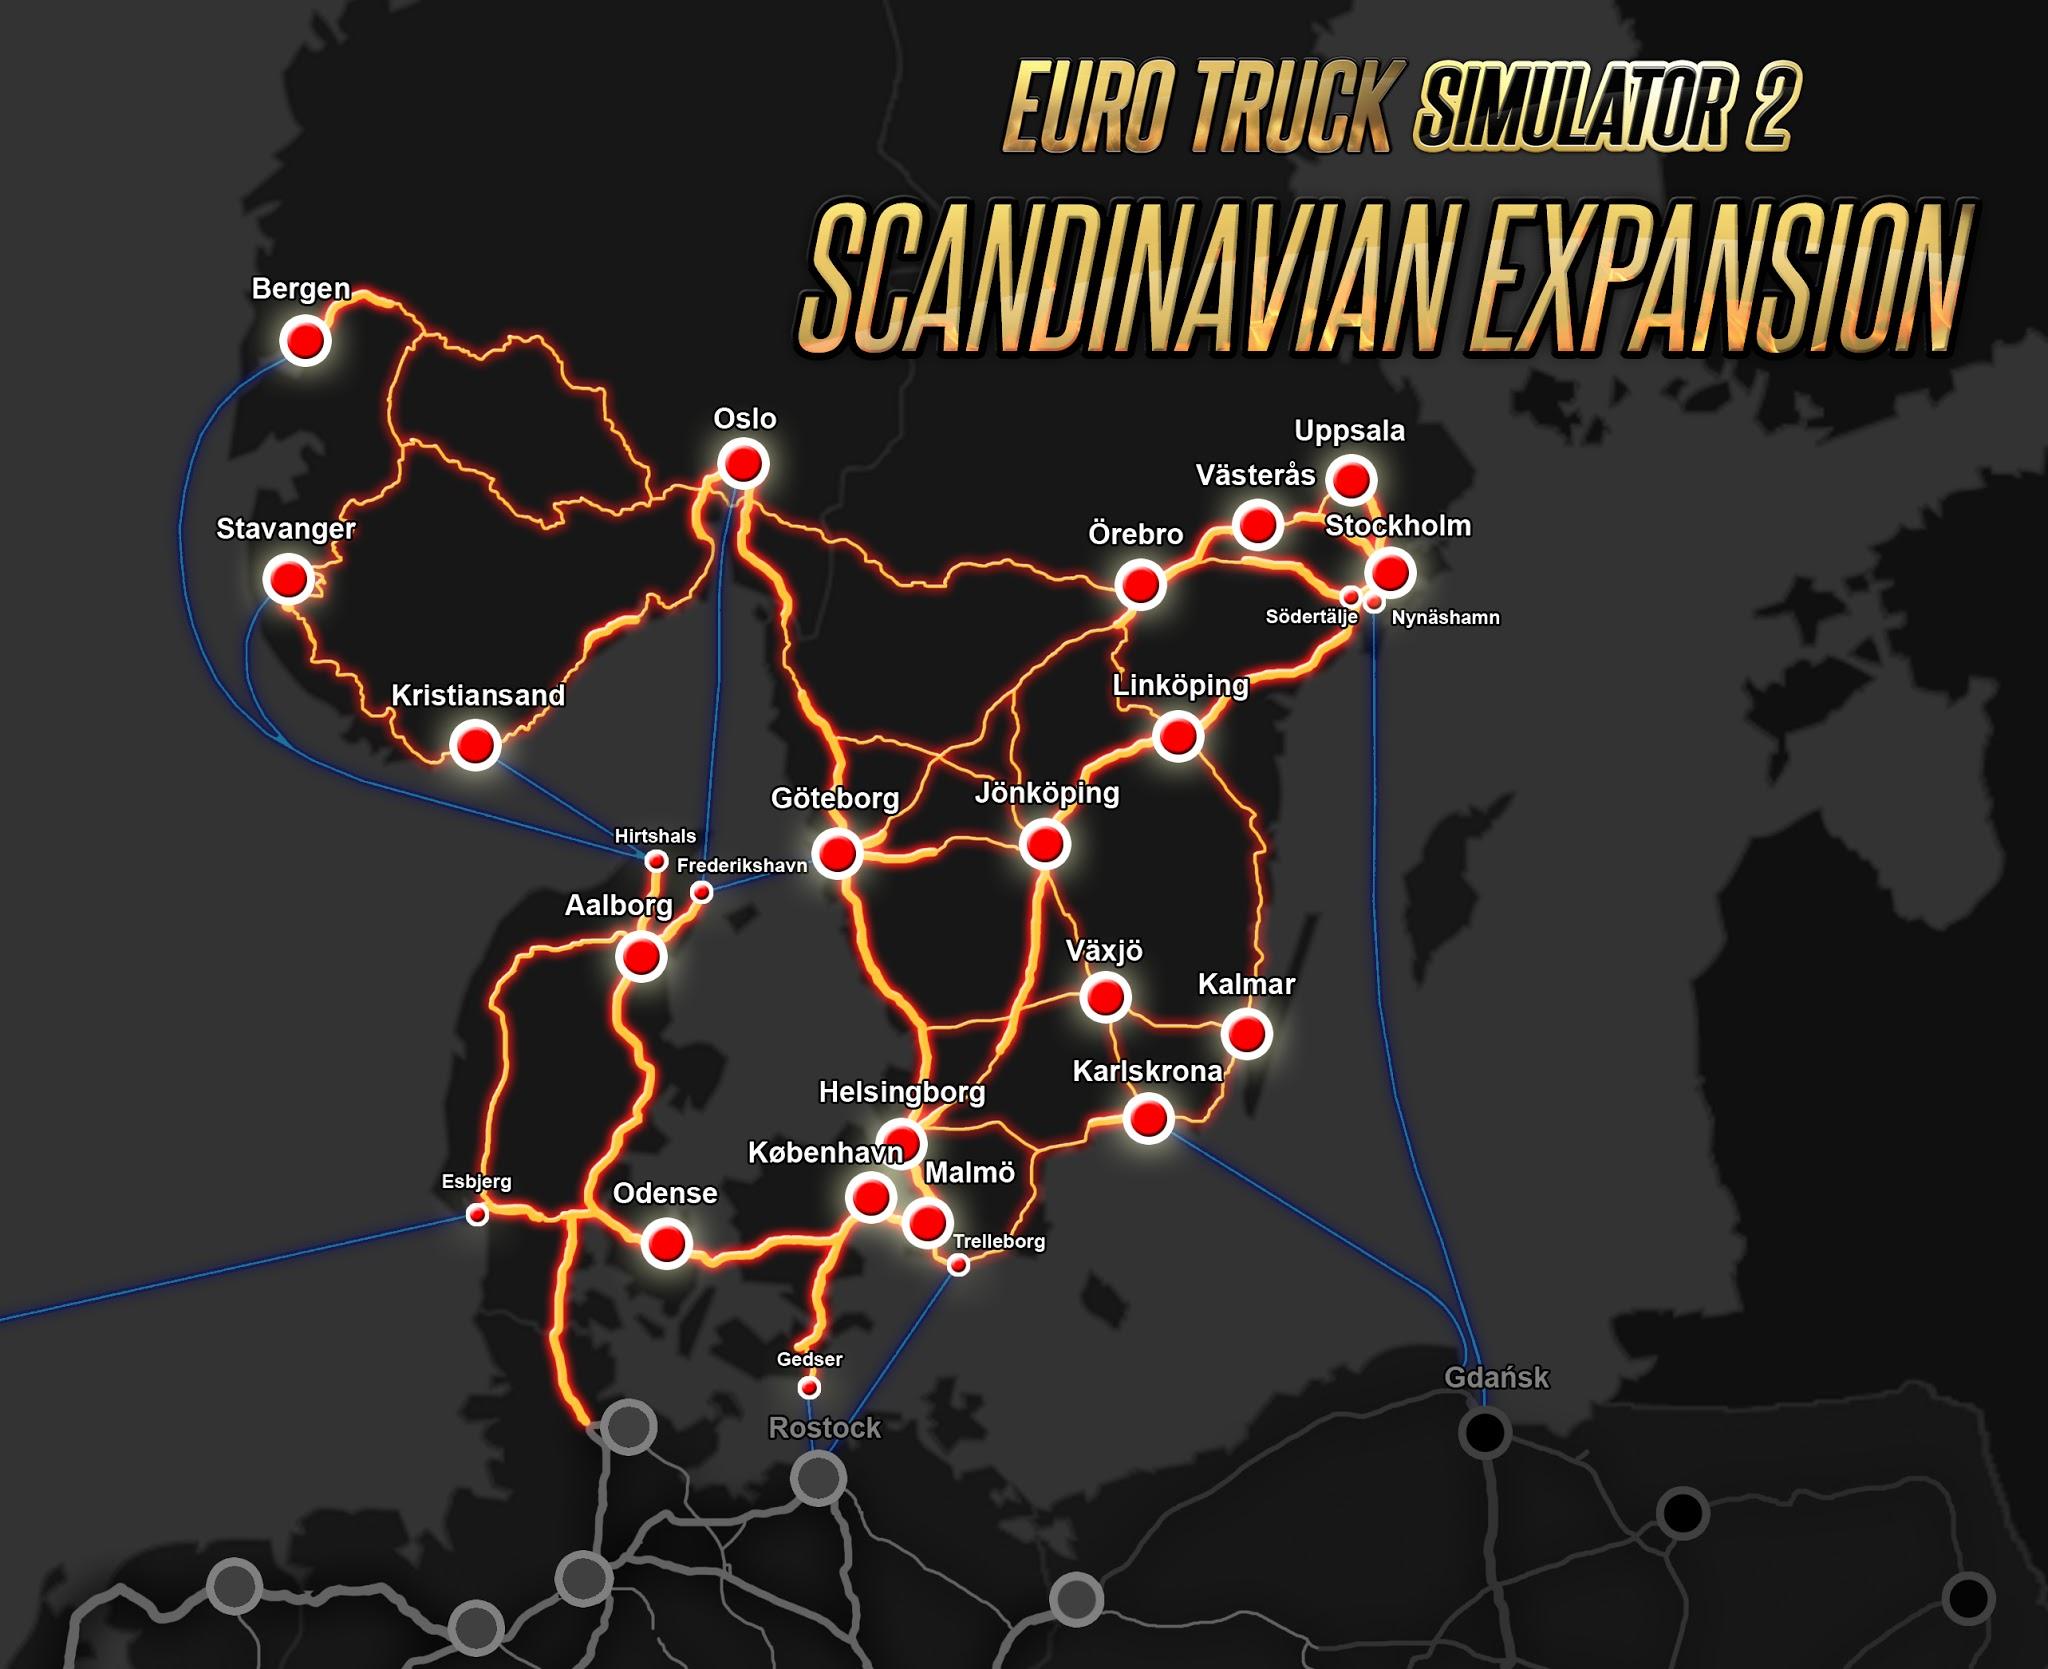 Buy Euro Truck Simulator 2 - Scandinavia from the Humble Store